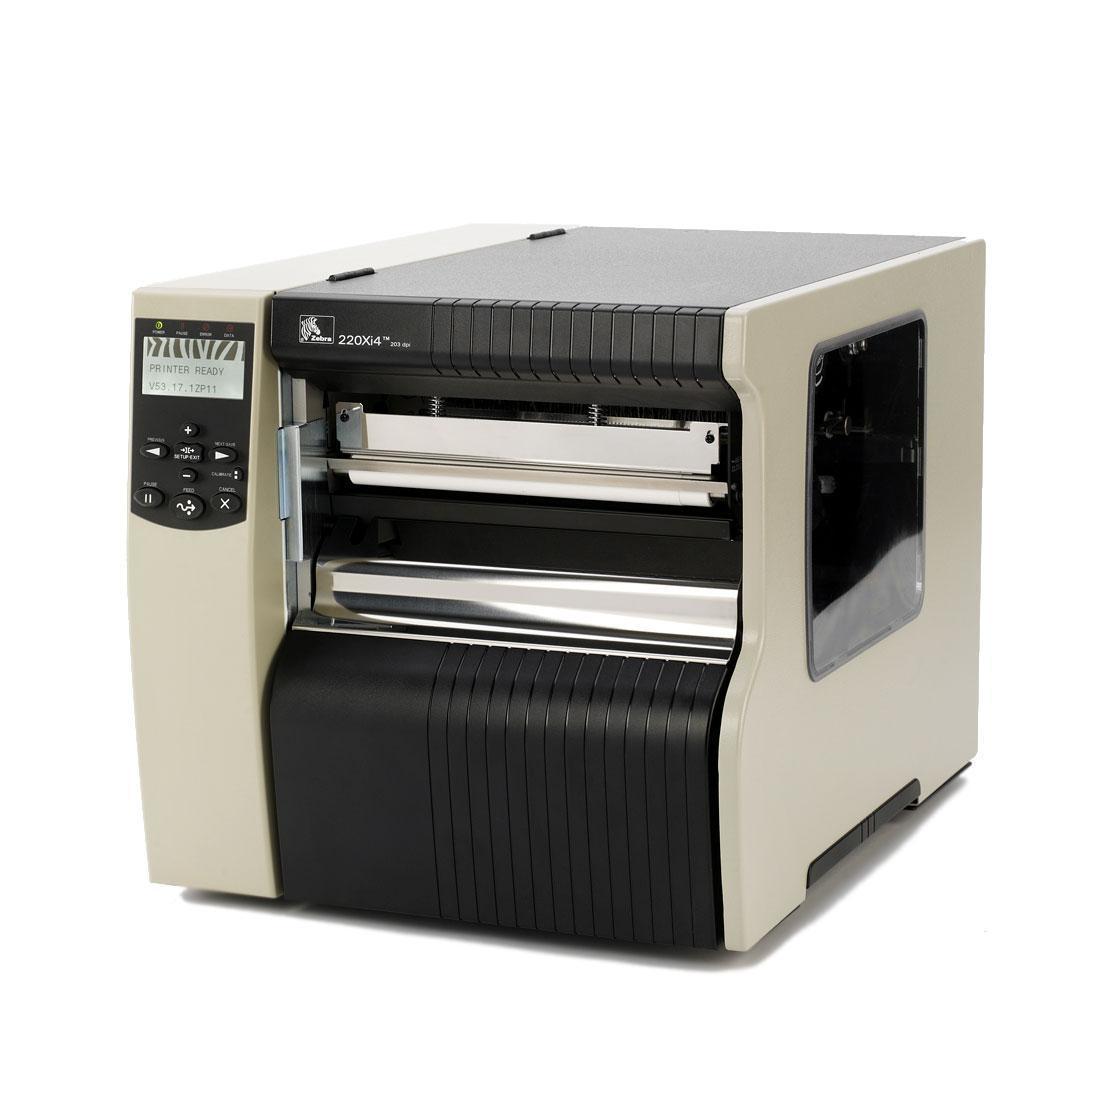 Zebra labelprinter 220Xi4 223-85E-00203 kopen – Online Bestellen ...